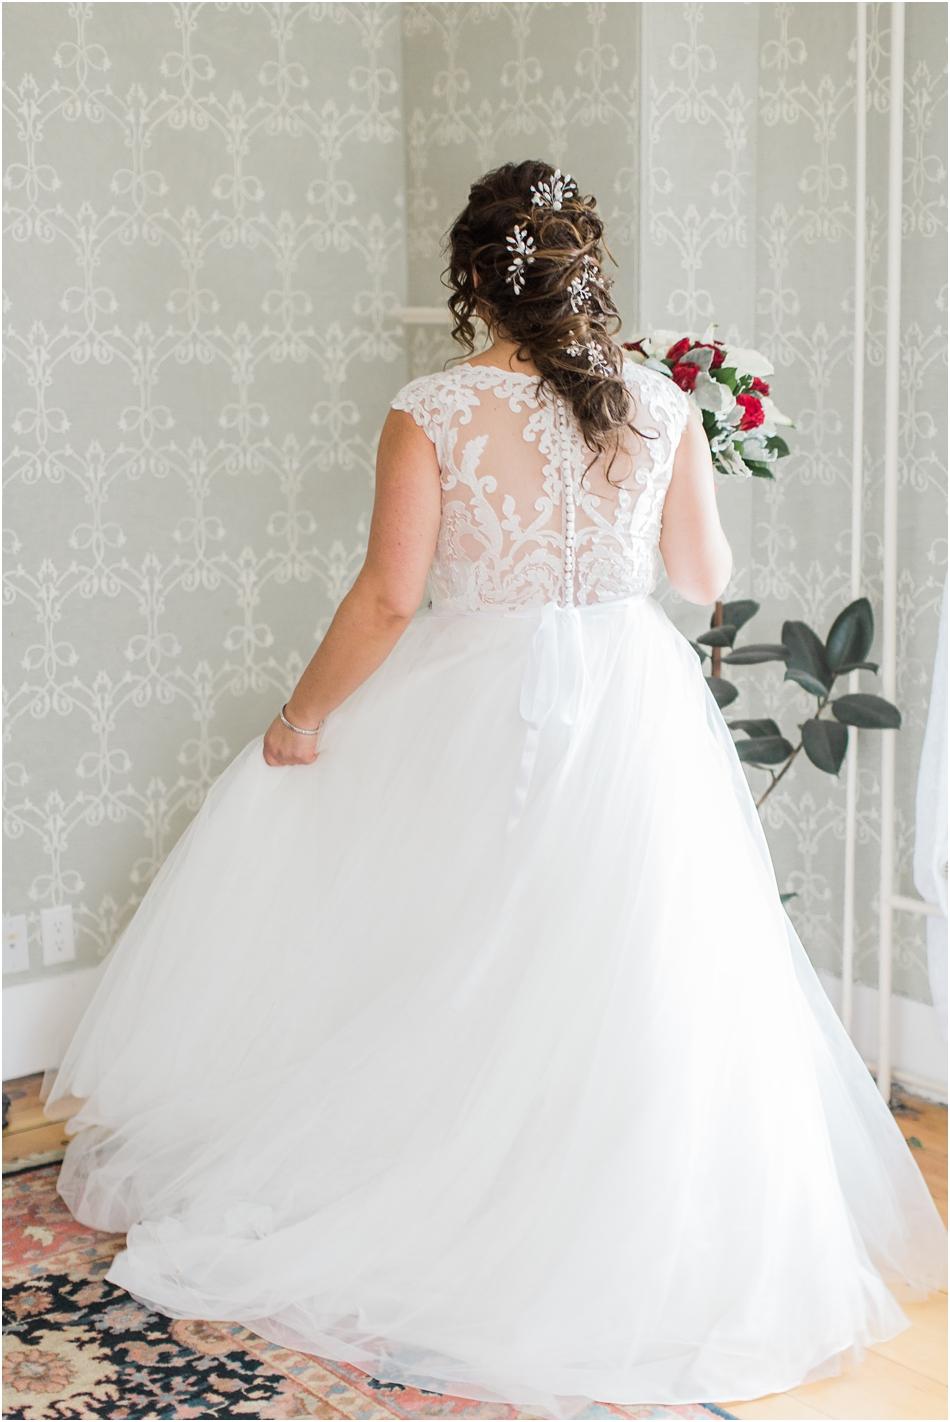 peirce_farm_winter_christmas_jessica_john_cape_cod_boston_new_england_wedding_photographer_Meredith_Jane_Photography_photo_0318.jpg